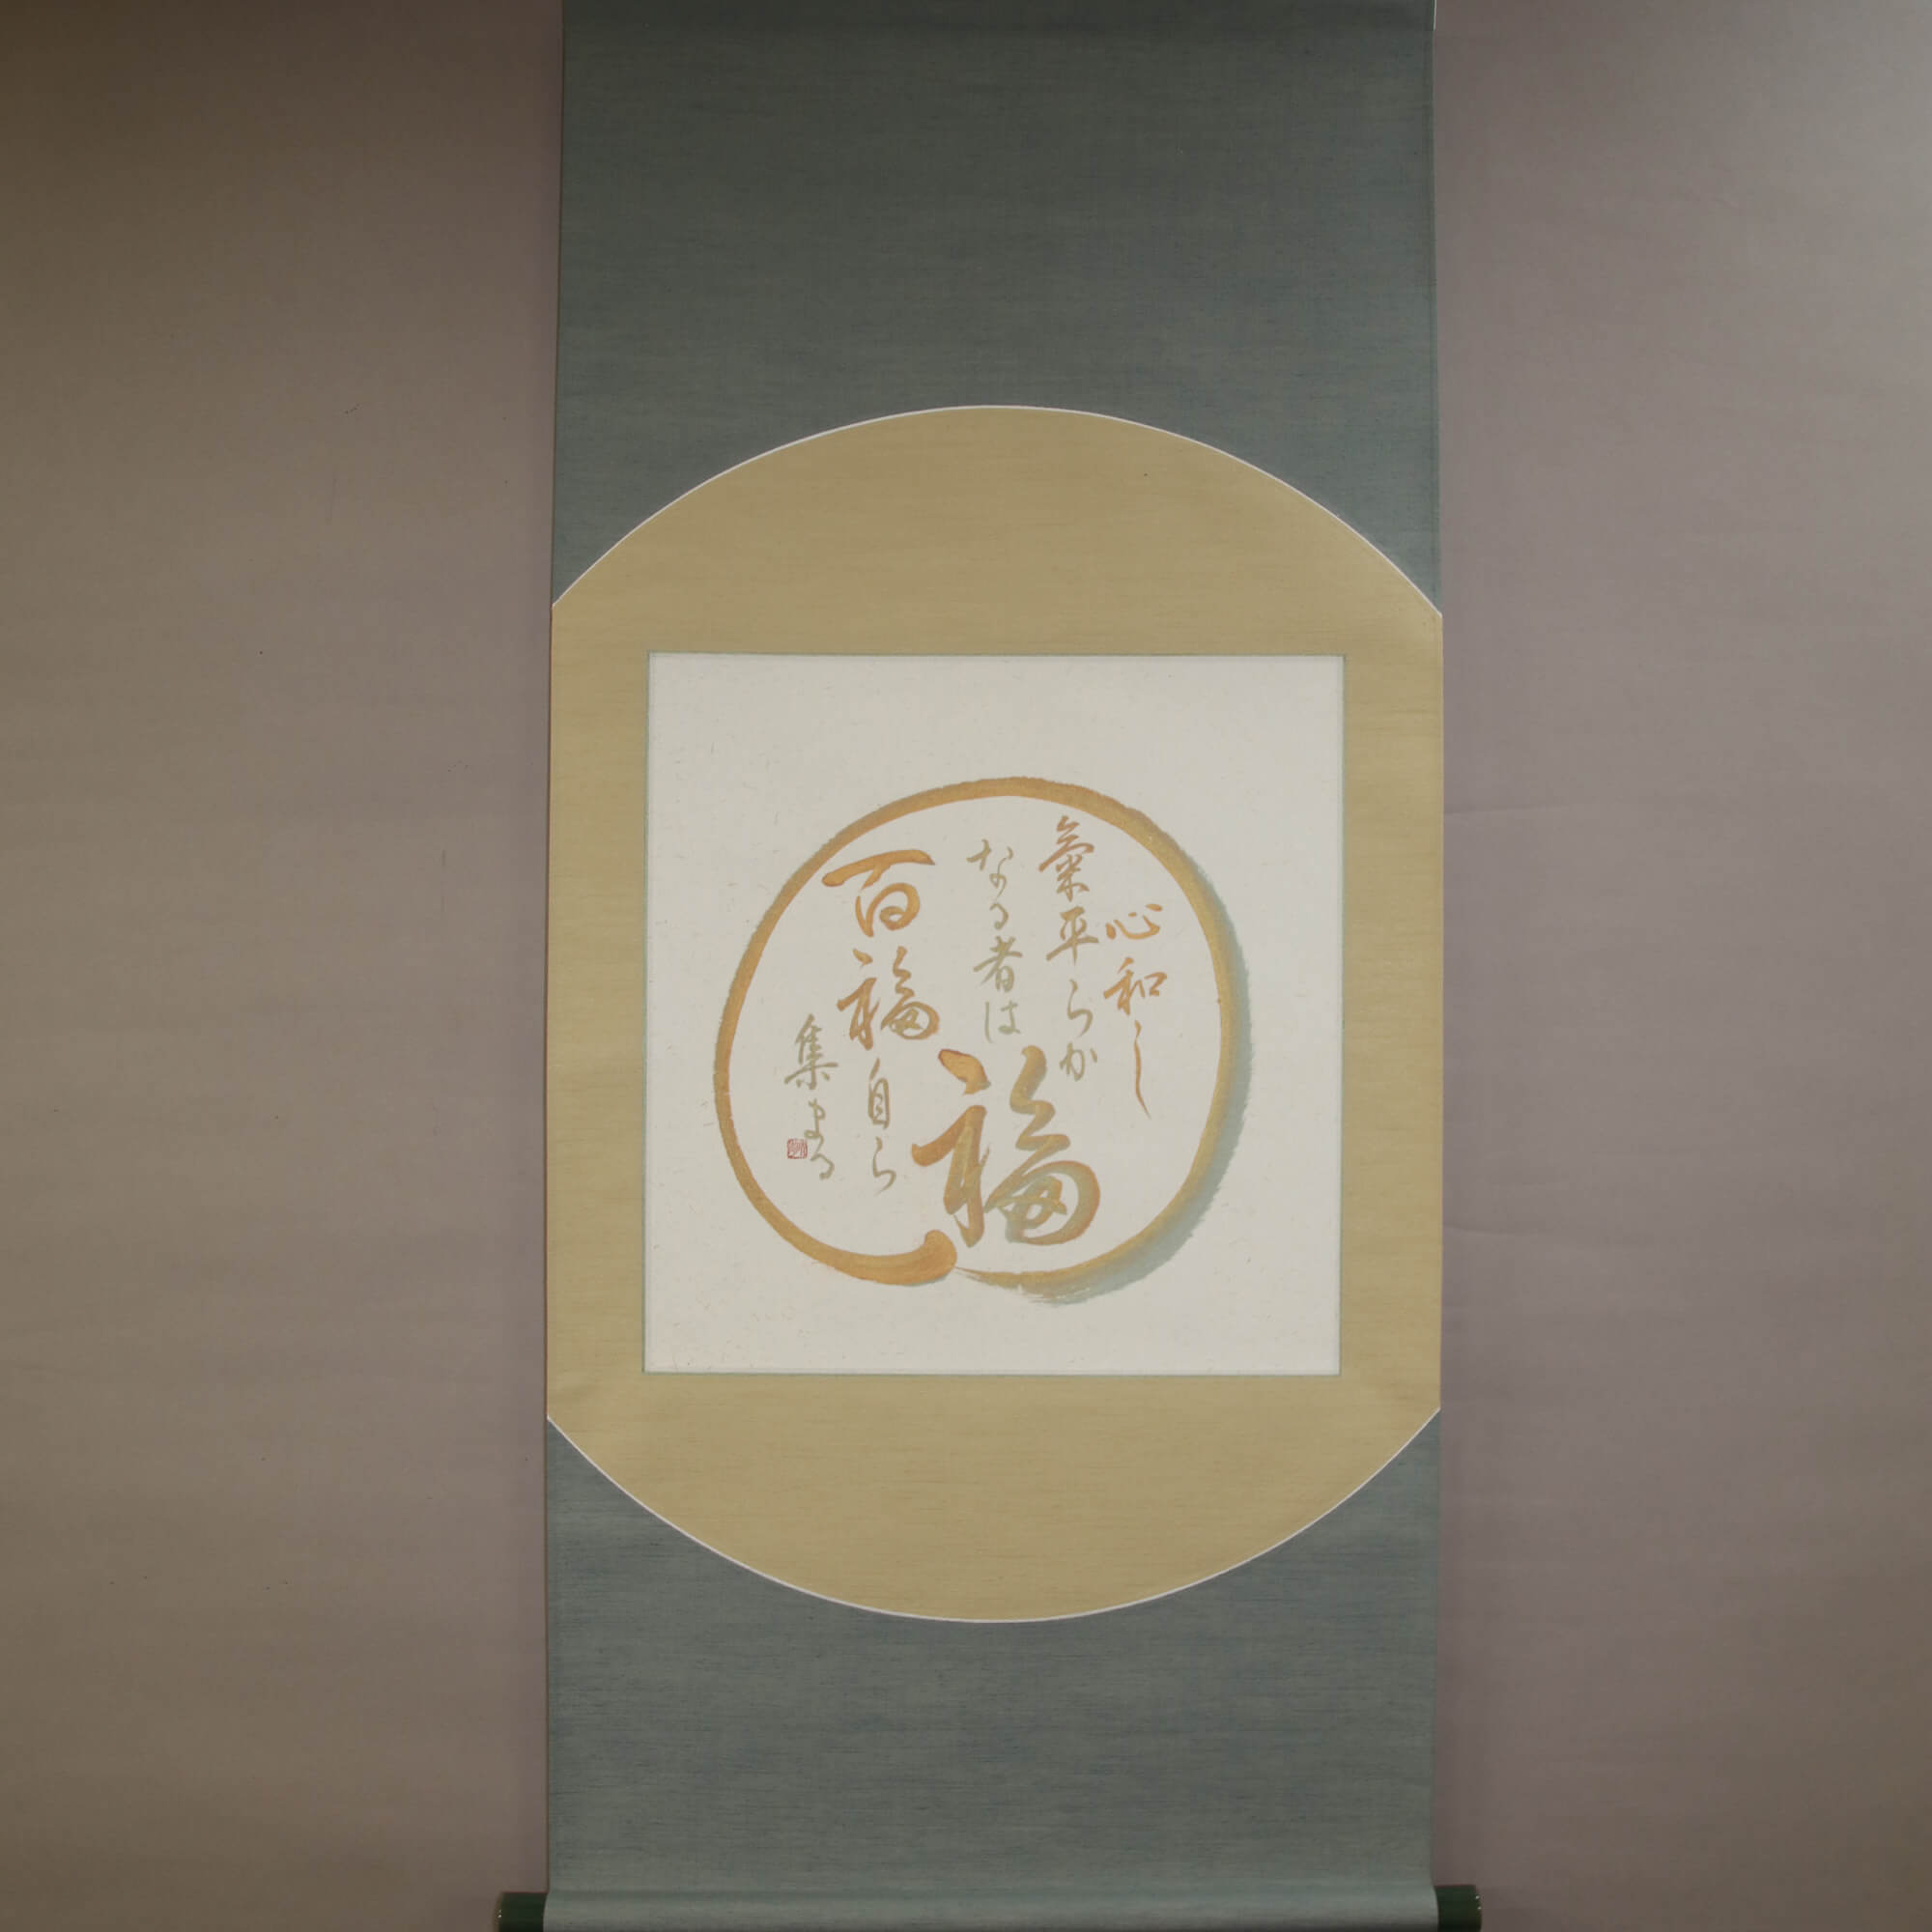 Calligraphy: Lots of Happiness / Kawai Eishū